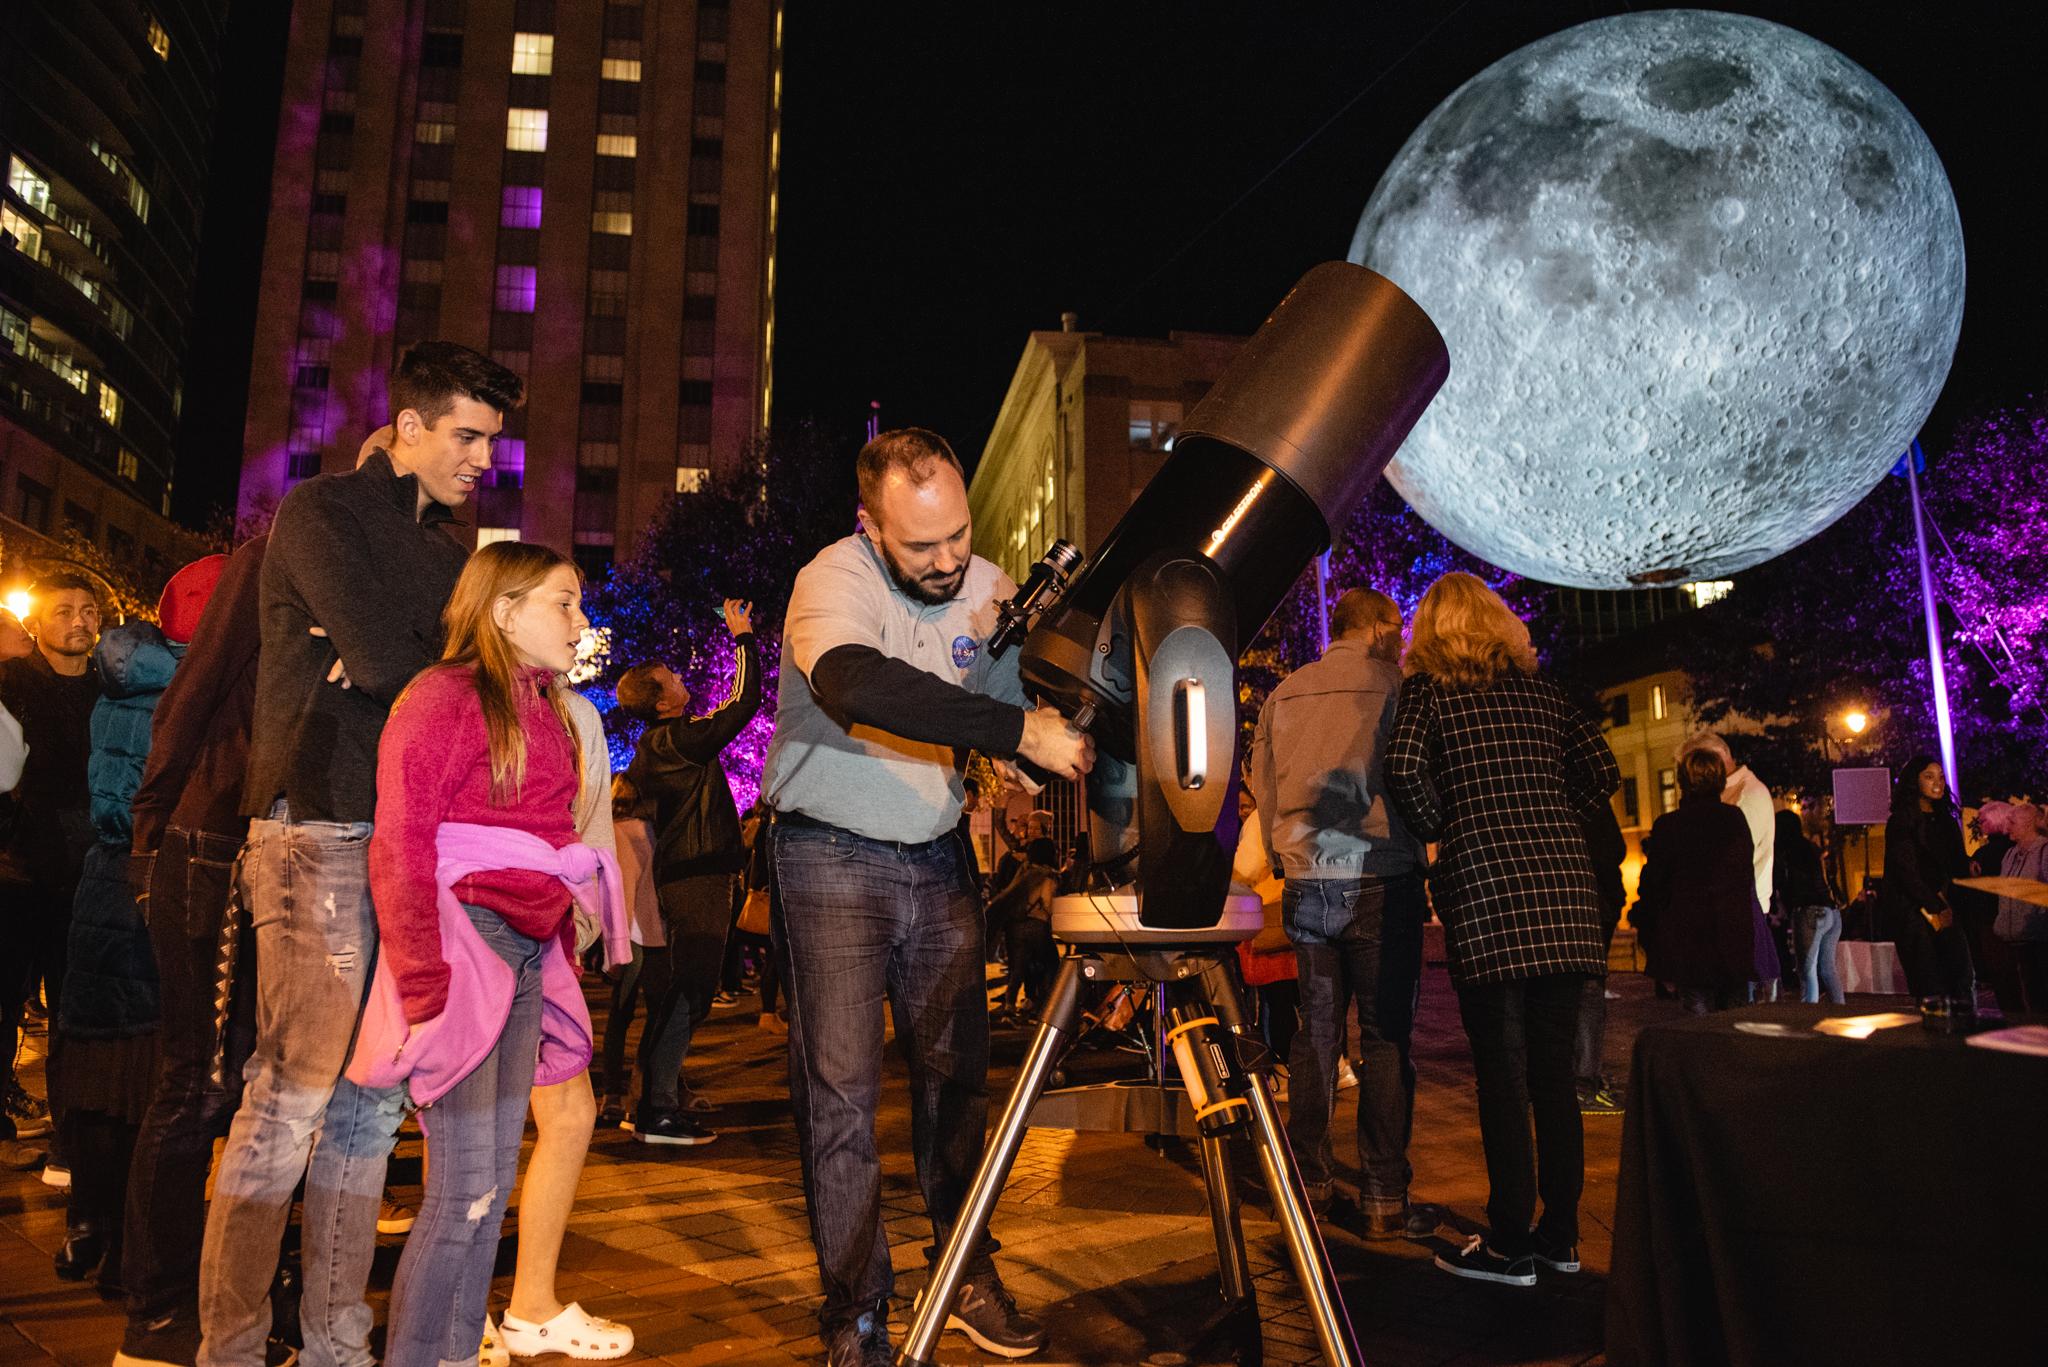 Bull Moon Rising & the Illumination of Historic Parrish Street